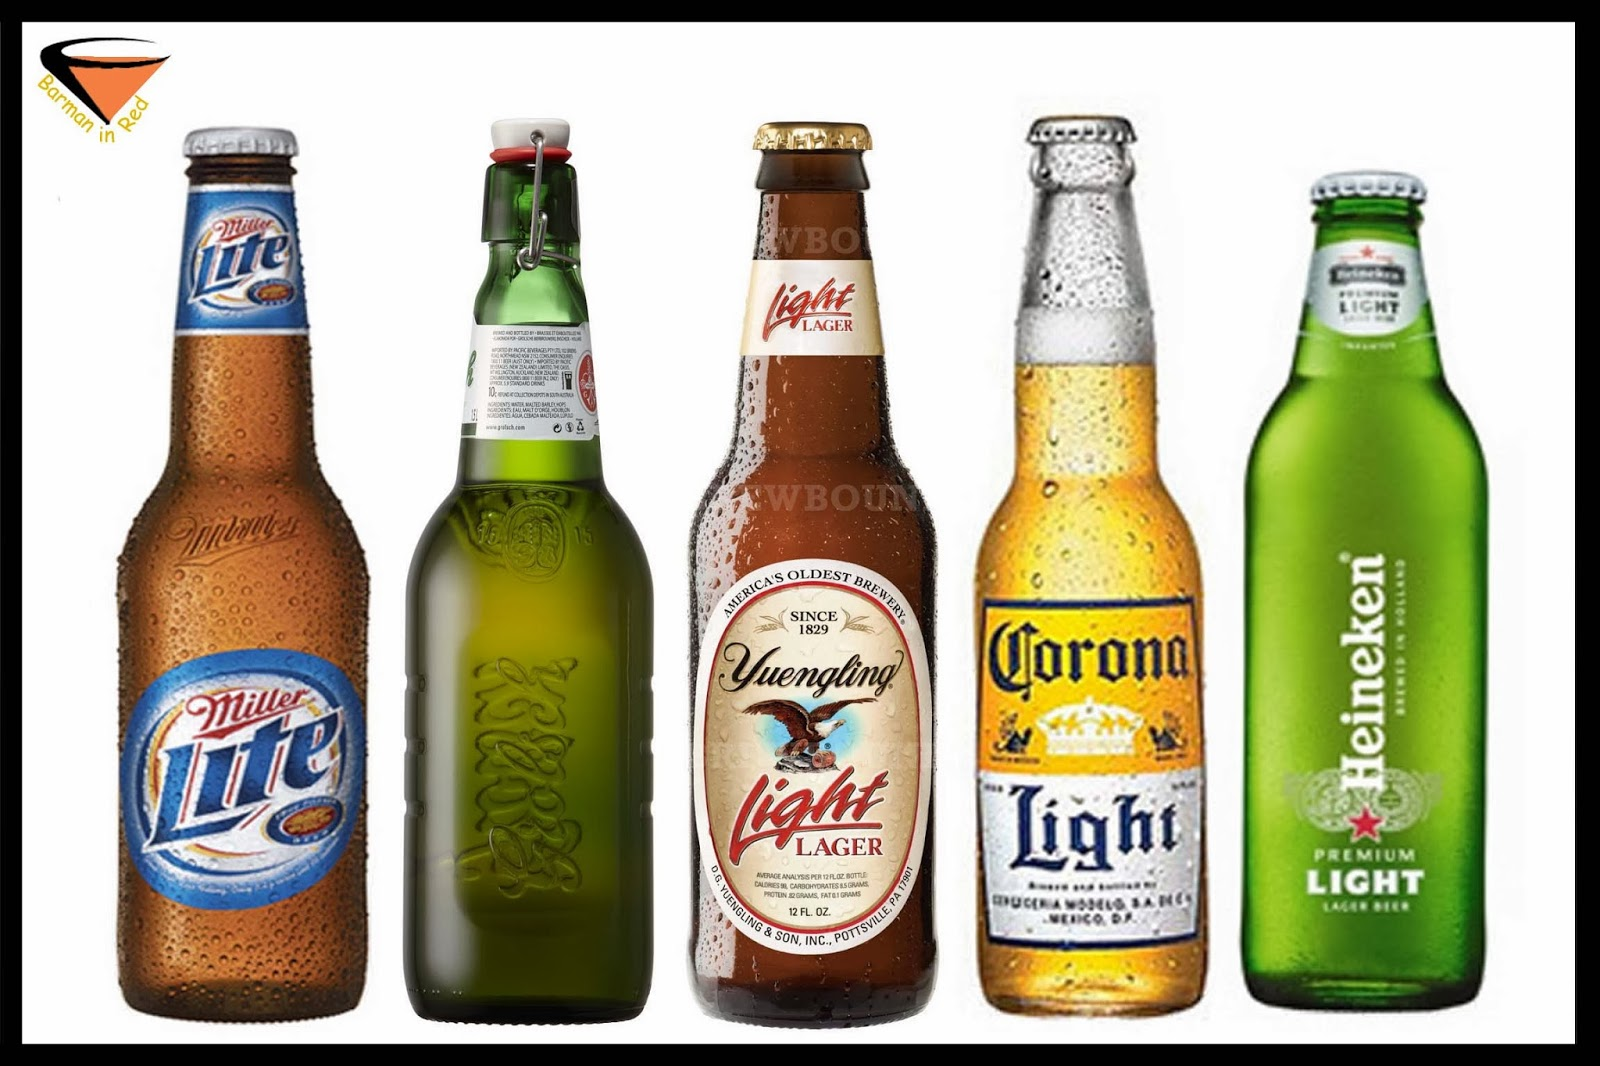 que tiene menos calorias cerveza o vino